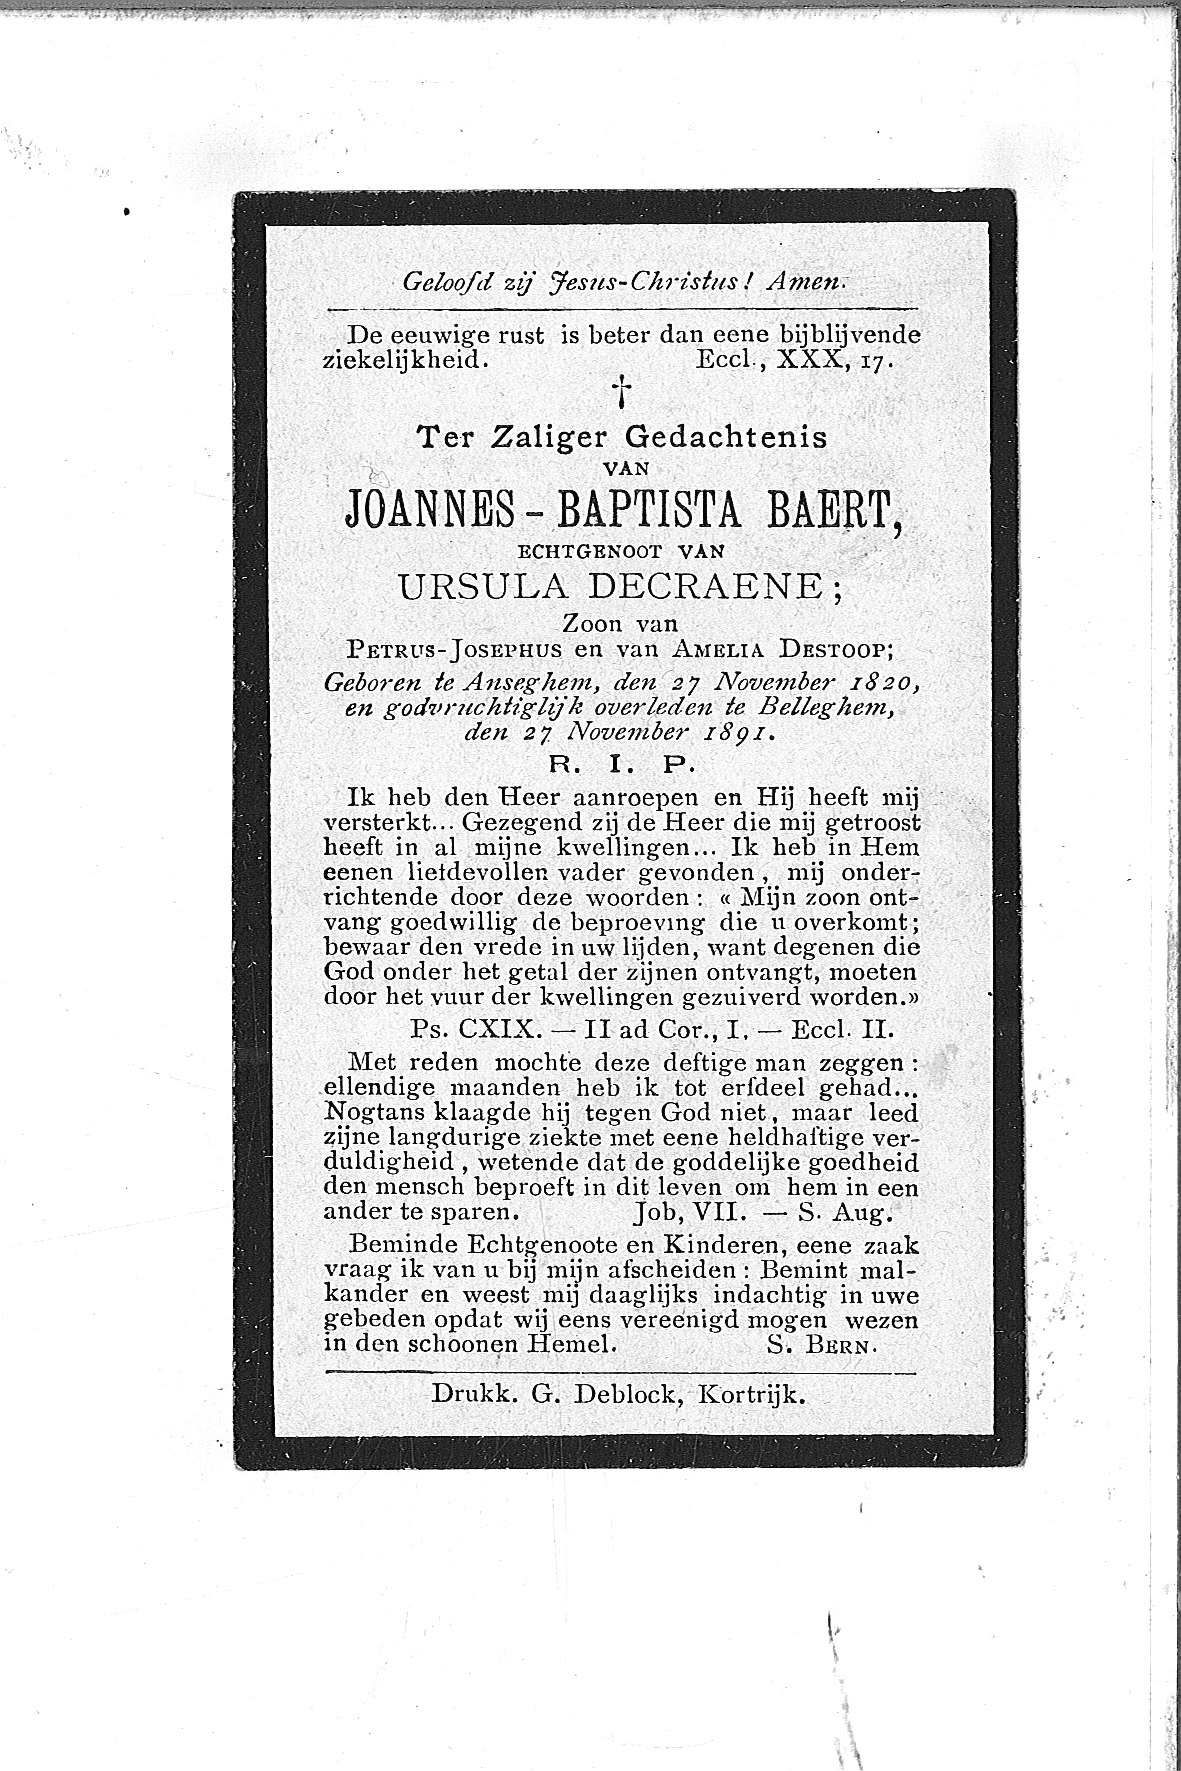 Joannes-Baptista(1891)20140701100228_00043.jpg